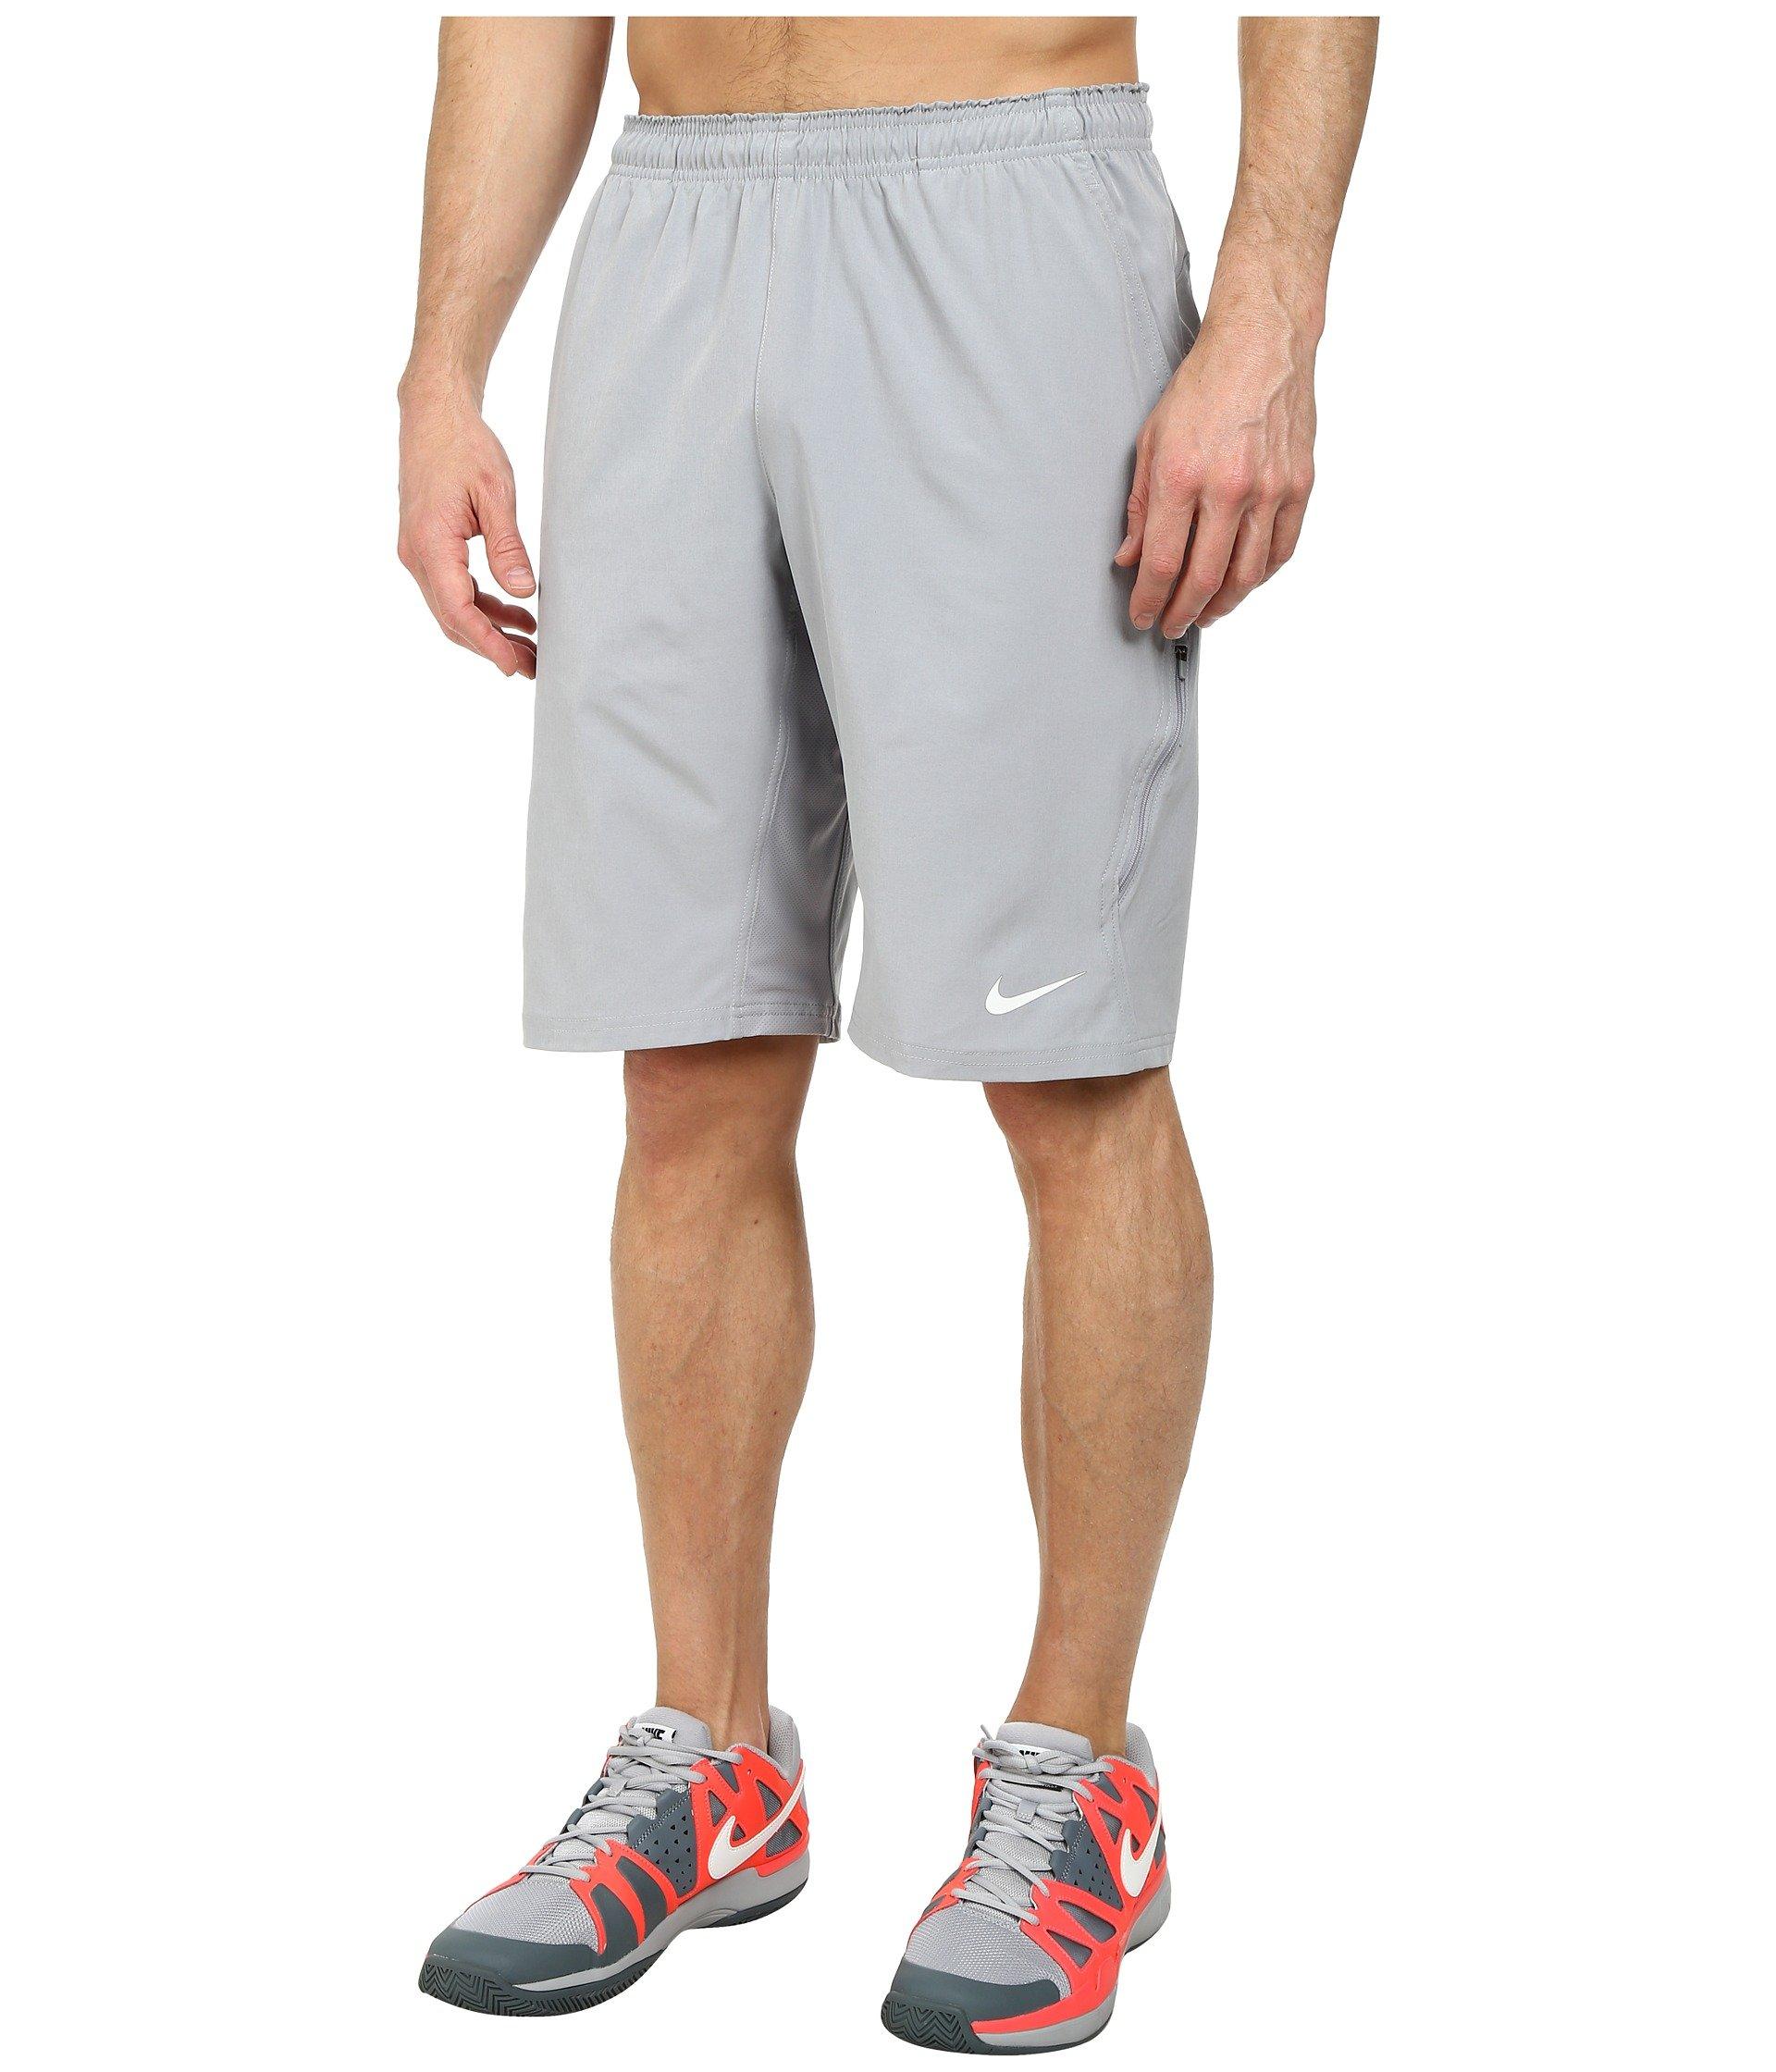 Nike Men's Dri-FIT Woven Tennis Short